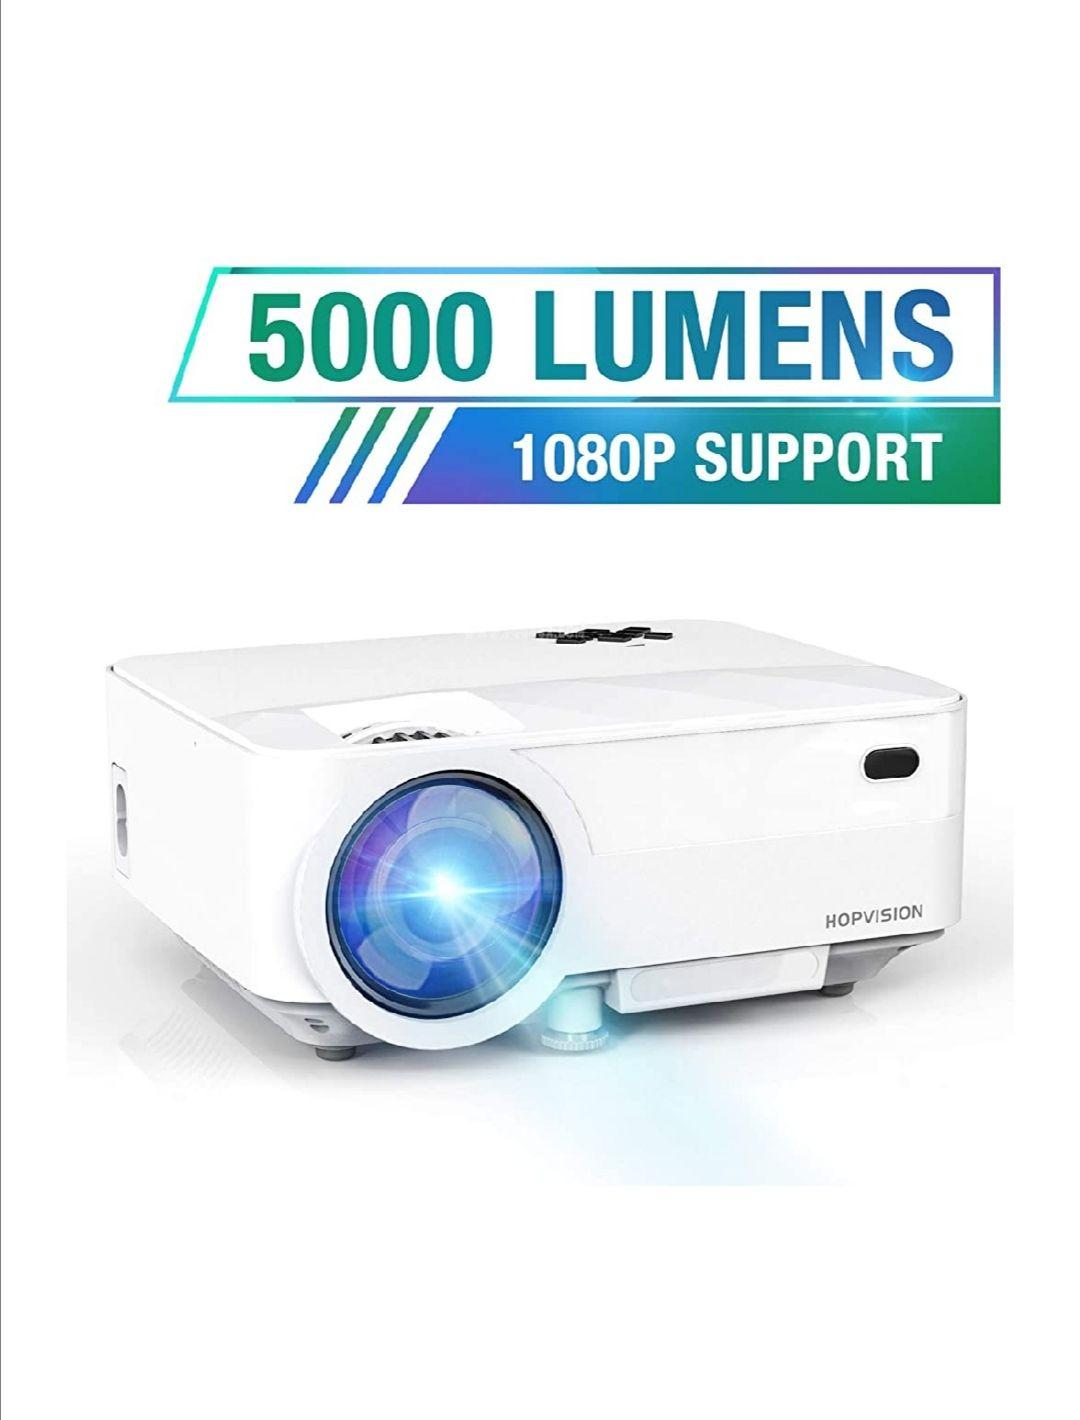 Mini Proyector 480p Full HD,Proyector Portátil de 5000 Lúmenes con Pantalla Máx